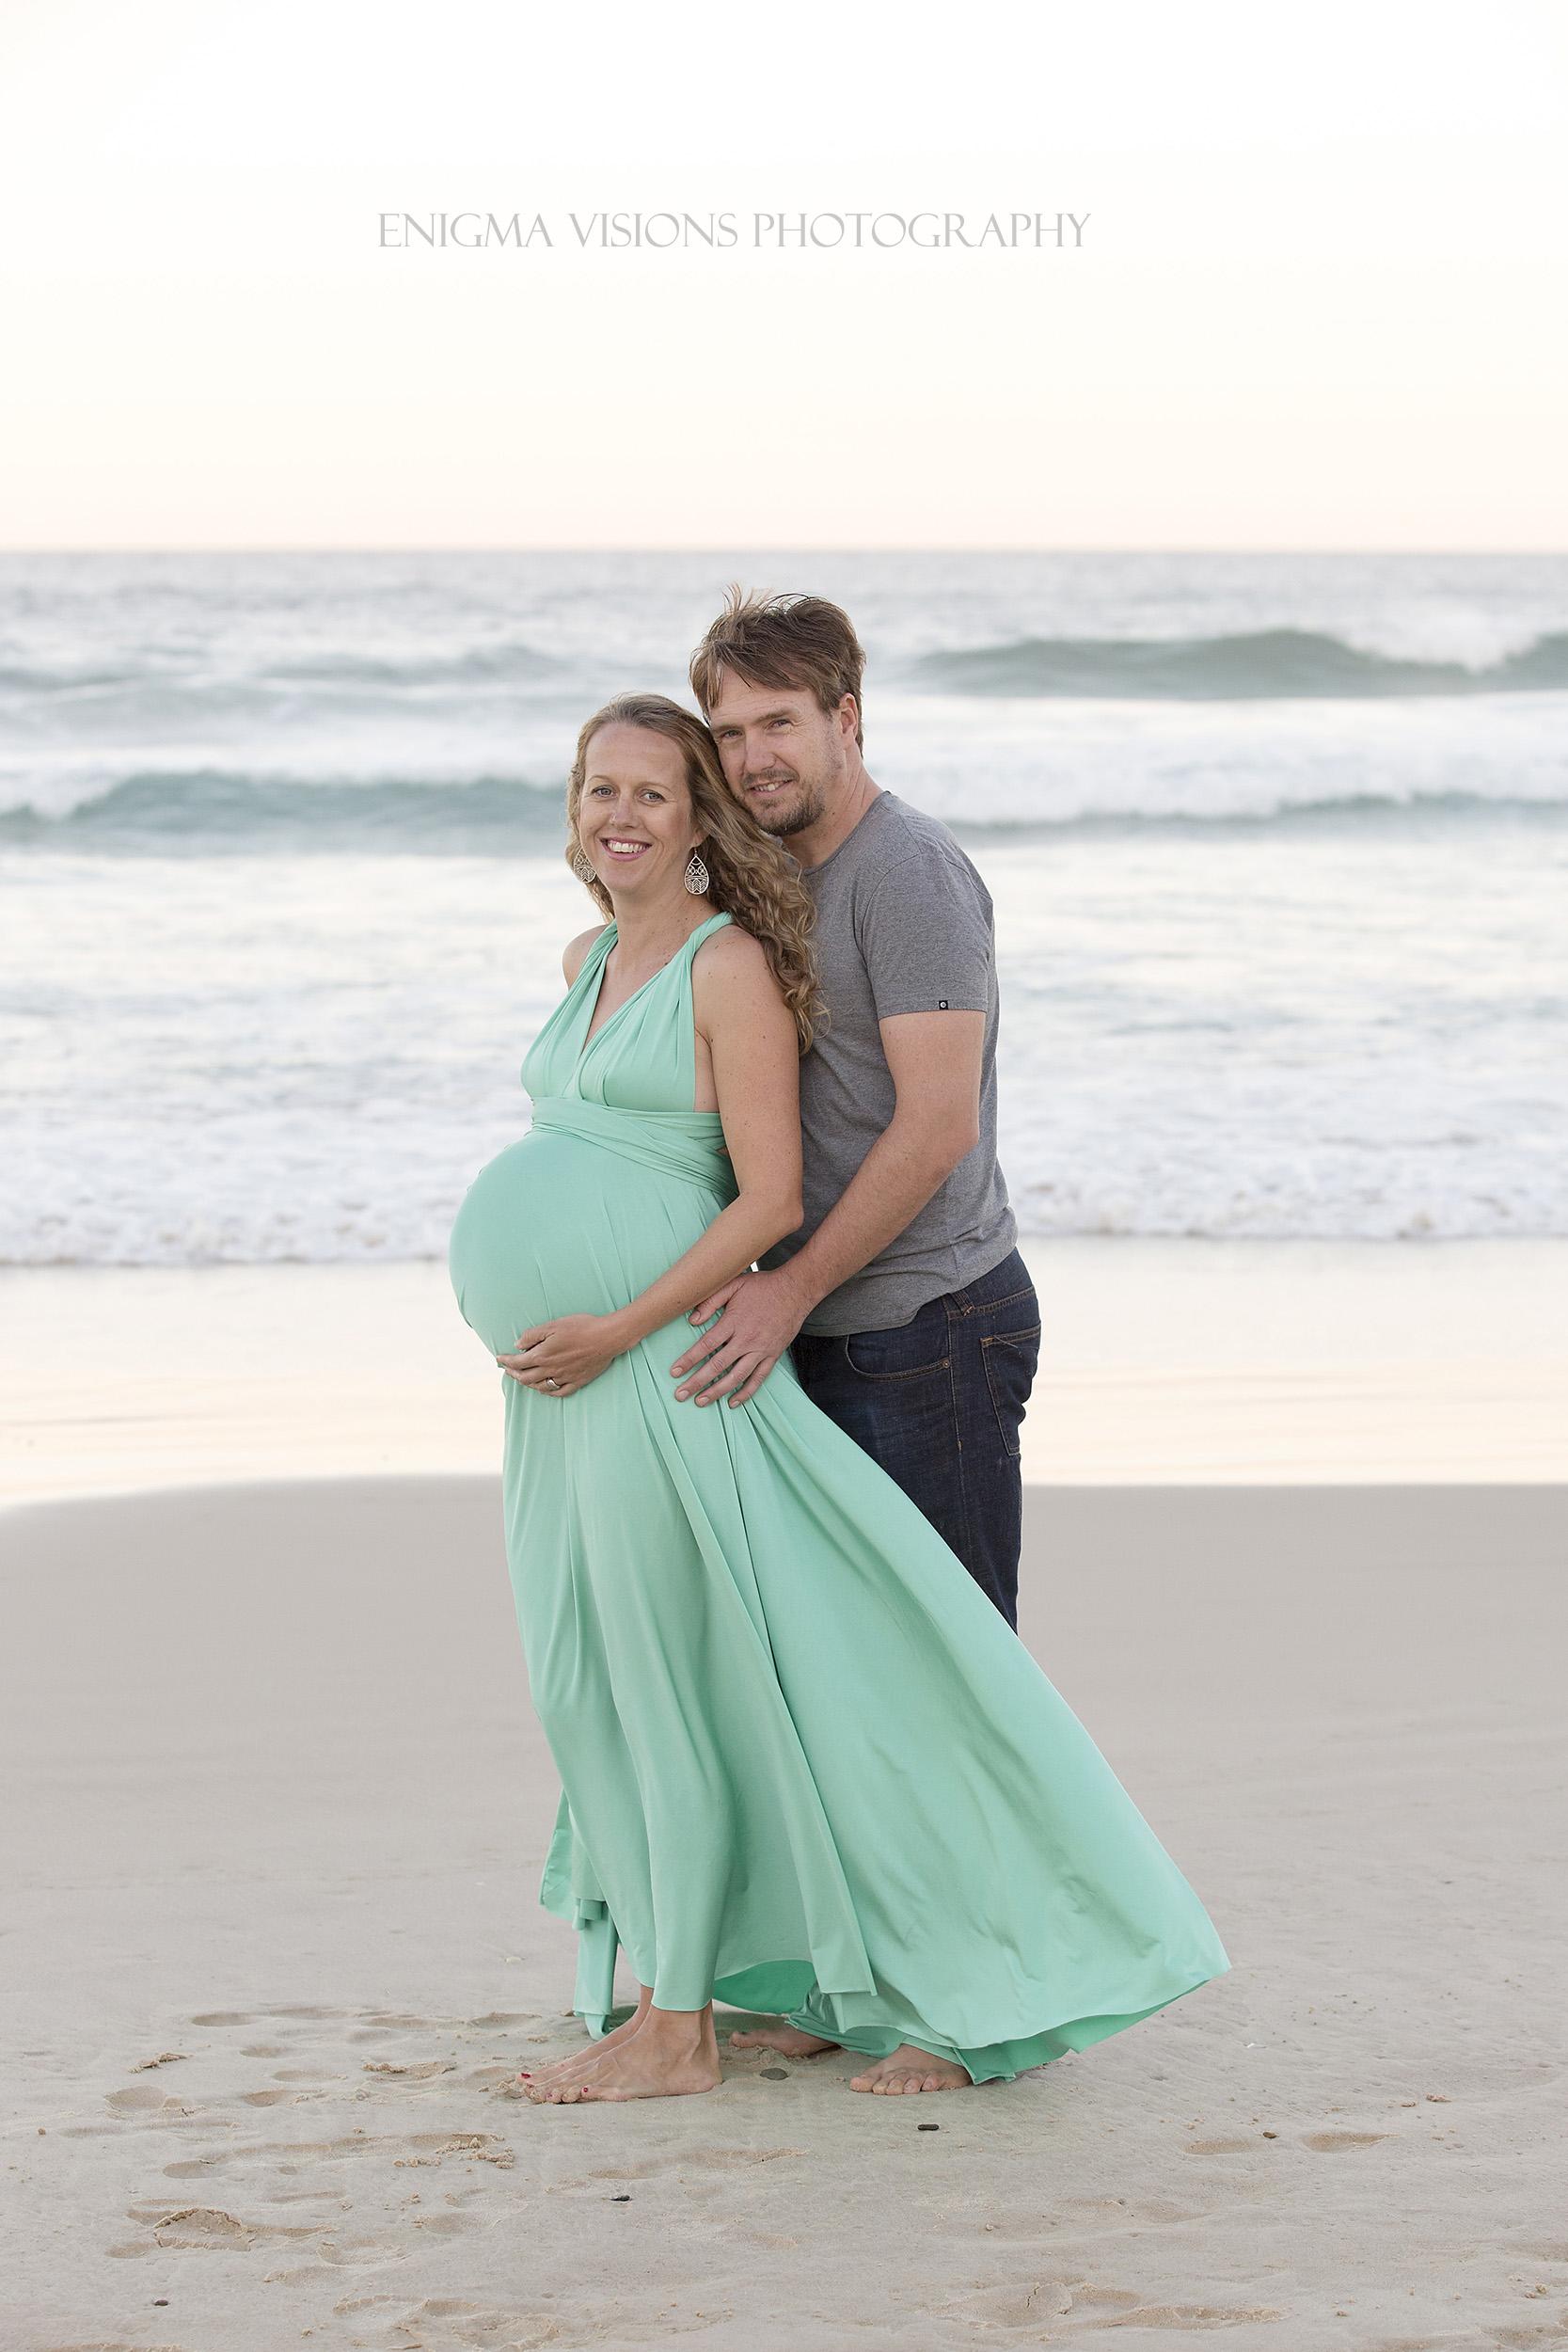 enigma_visions_photography_maternity_melandandrew_kingscliff (43).jpg